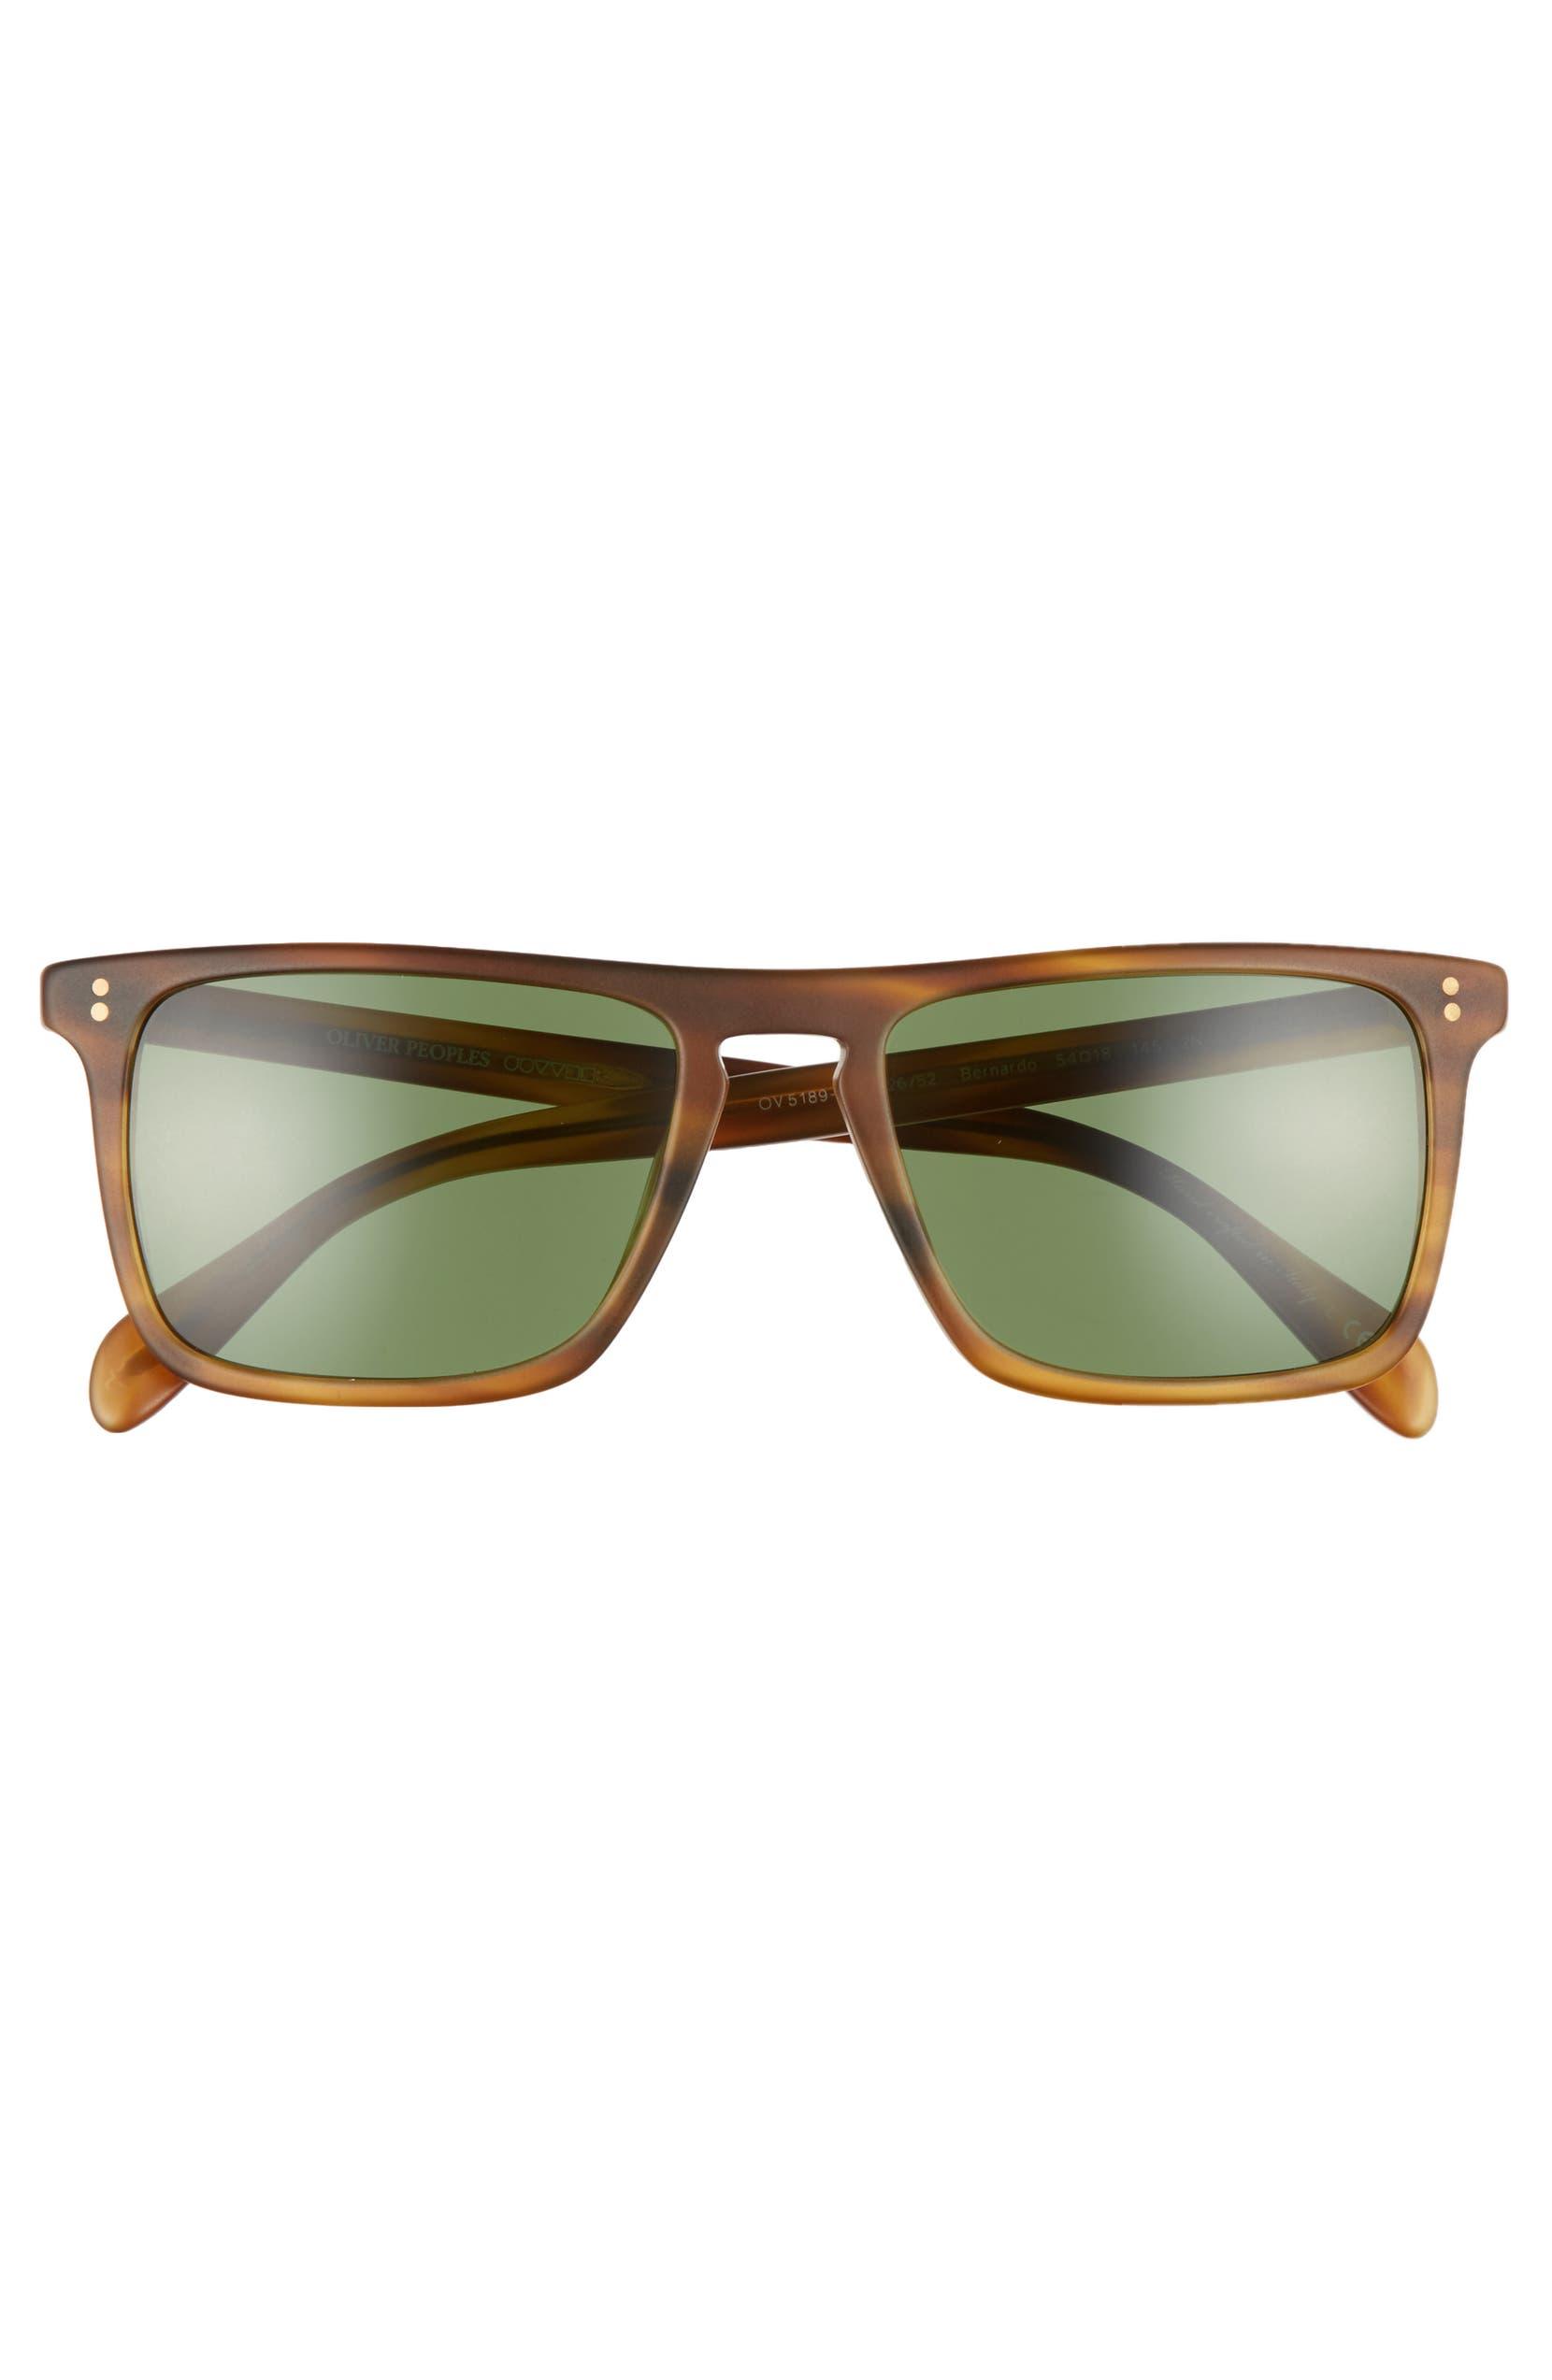 24830bc8187 Oliver Peoples Bernardo 54mm Polarized Square Sunglasses